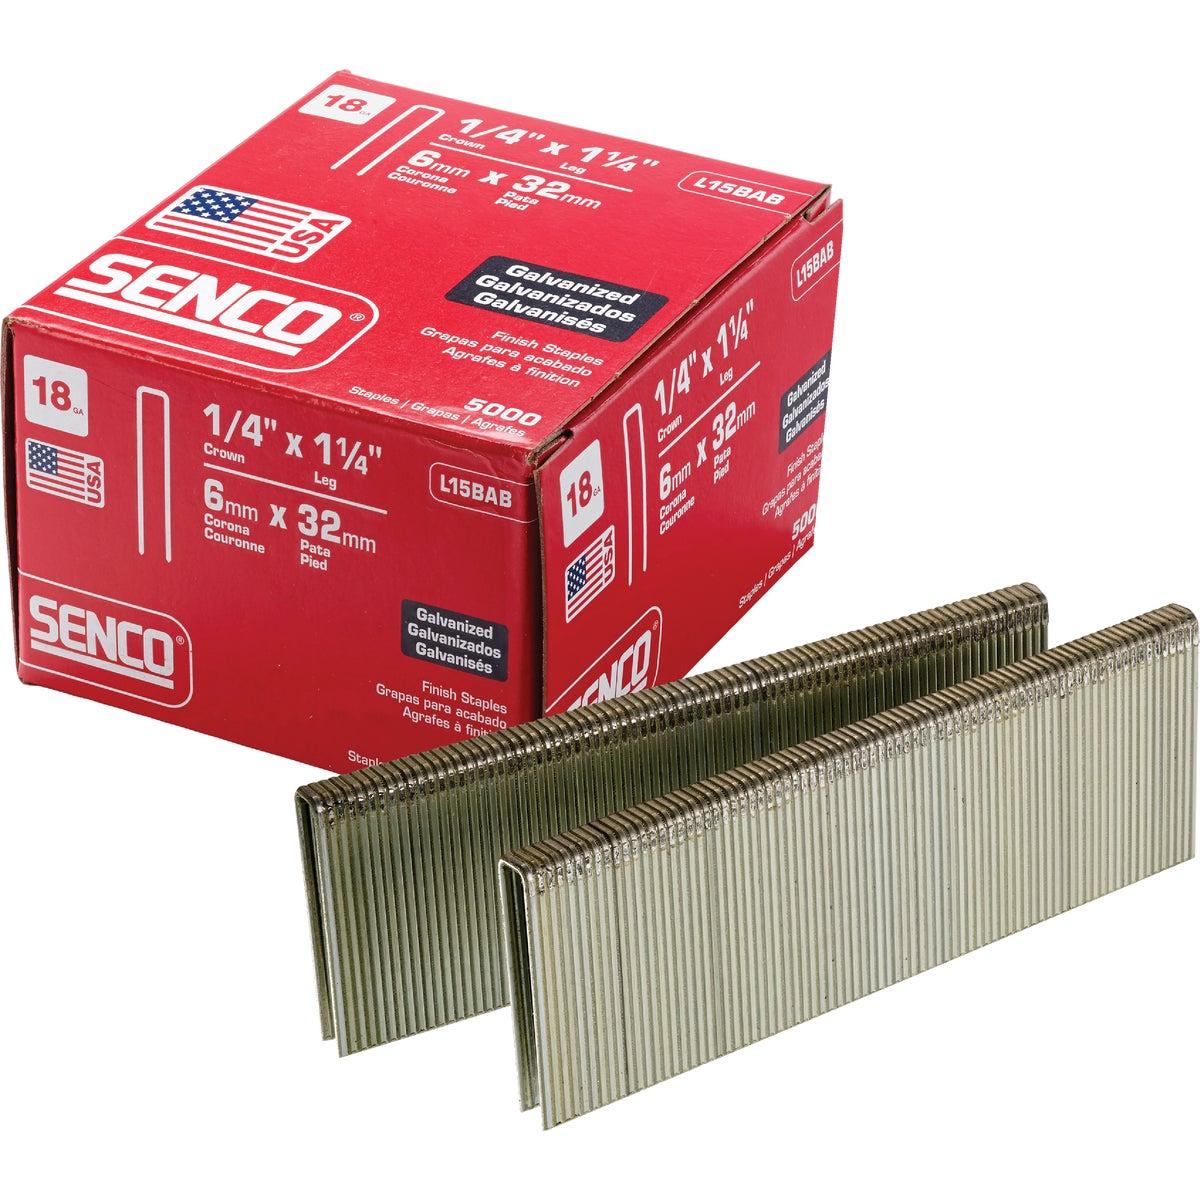 1-1/4X1/4 STAPLE - L15BAB by Senco Brands